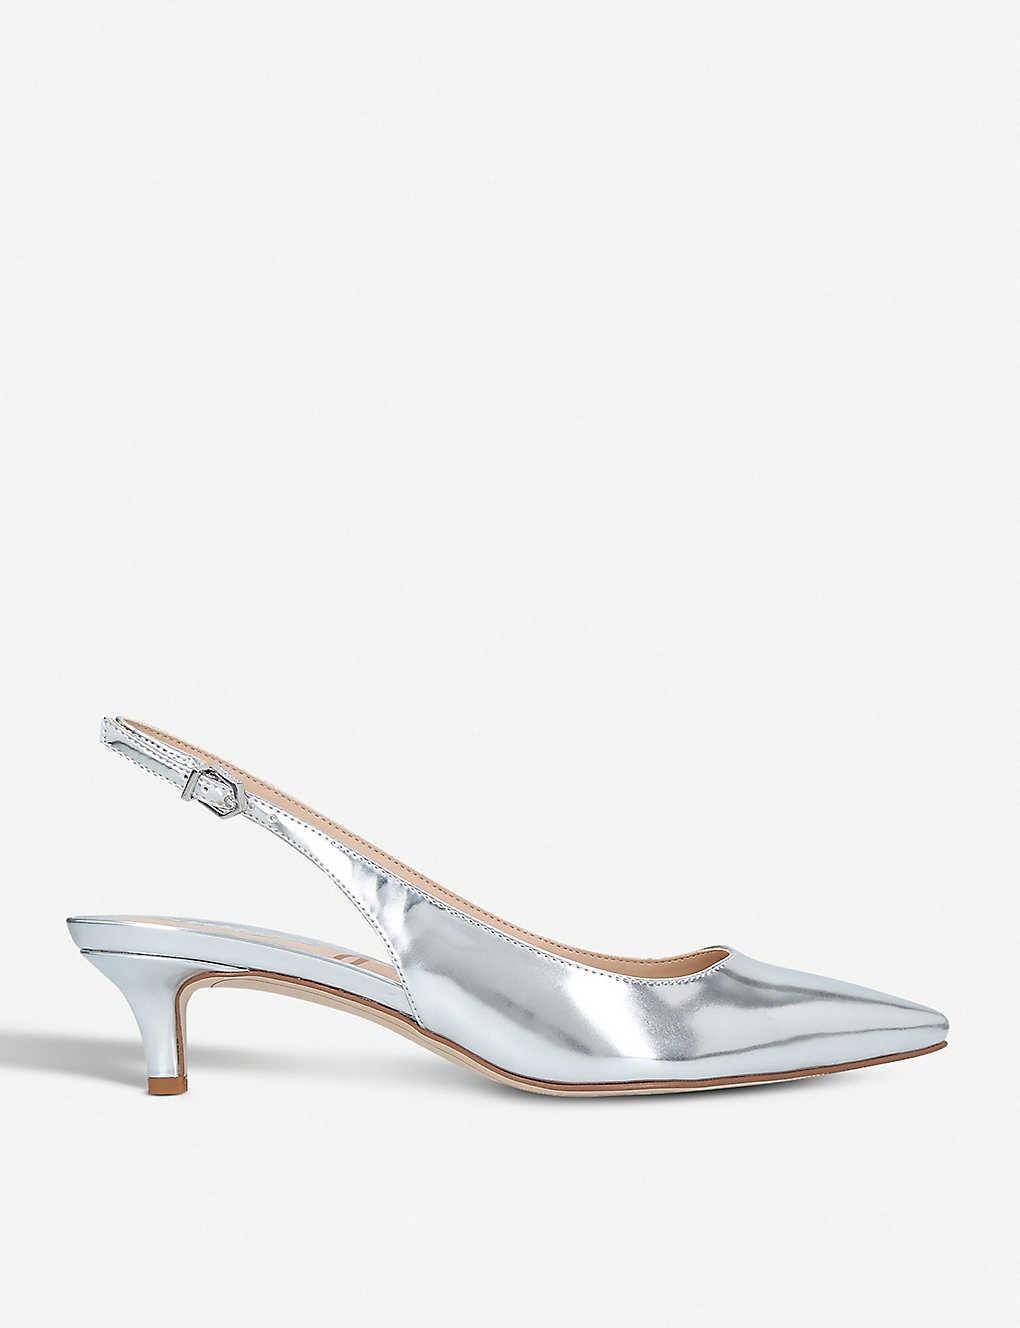 04c8e81b259 SAM EDELMAN - Ludlow leather slingback kitten heels